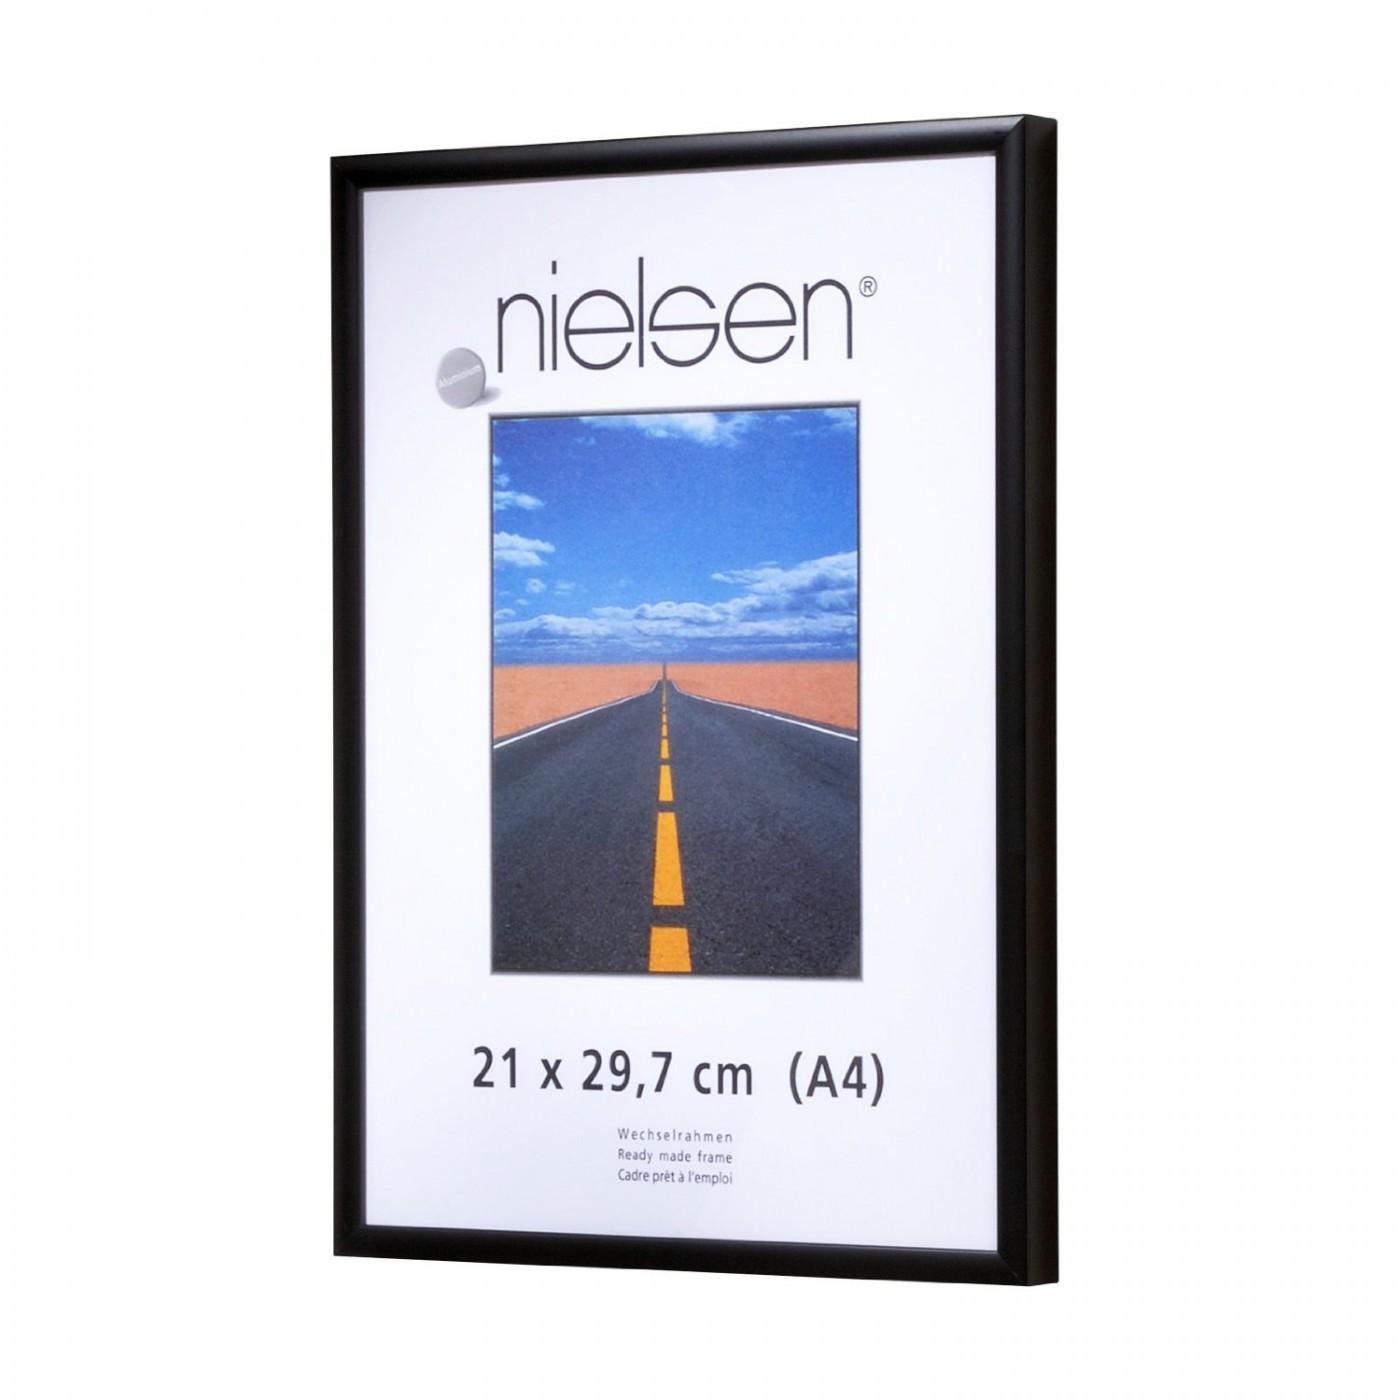 NIELSEN Pearl 30x40 cm Matt Black Picture Frame | The Artch